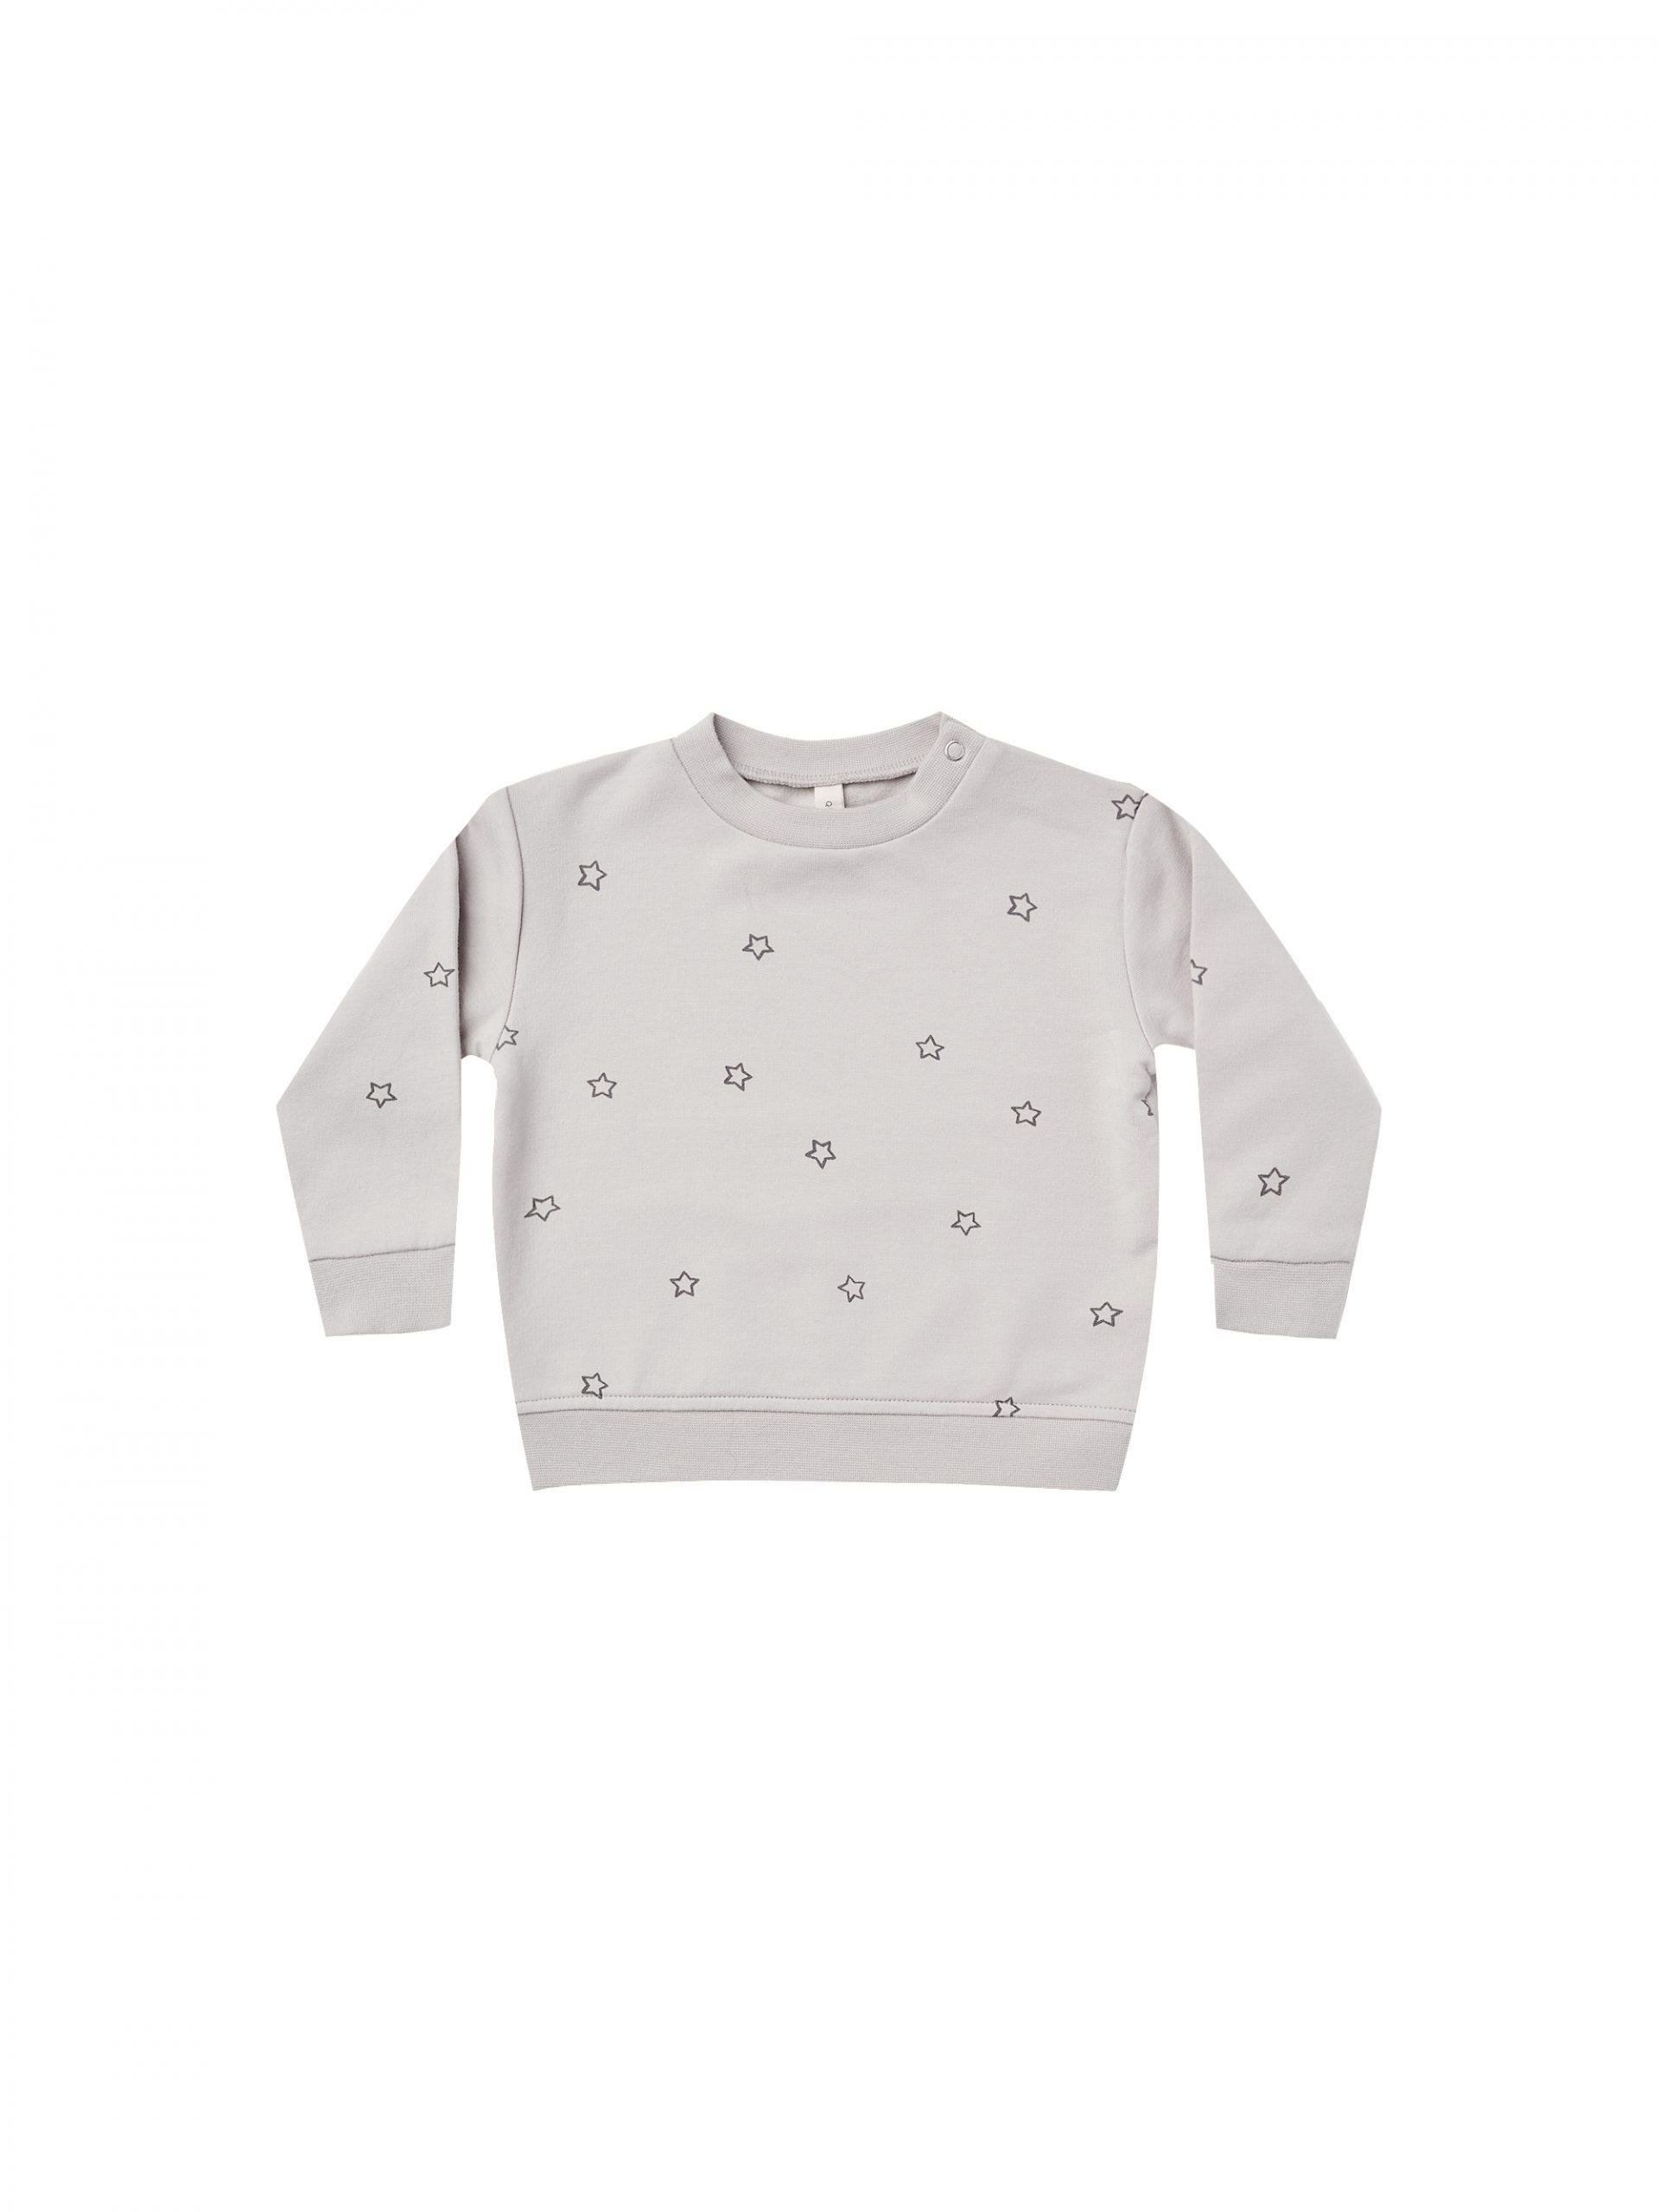 Quincy Mae Fleece Sweatshirt (stars ash)**PRE ORDER